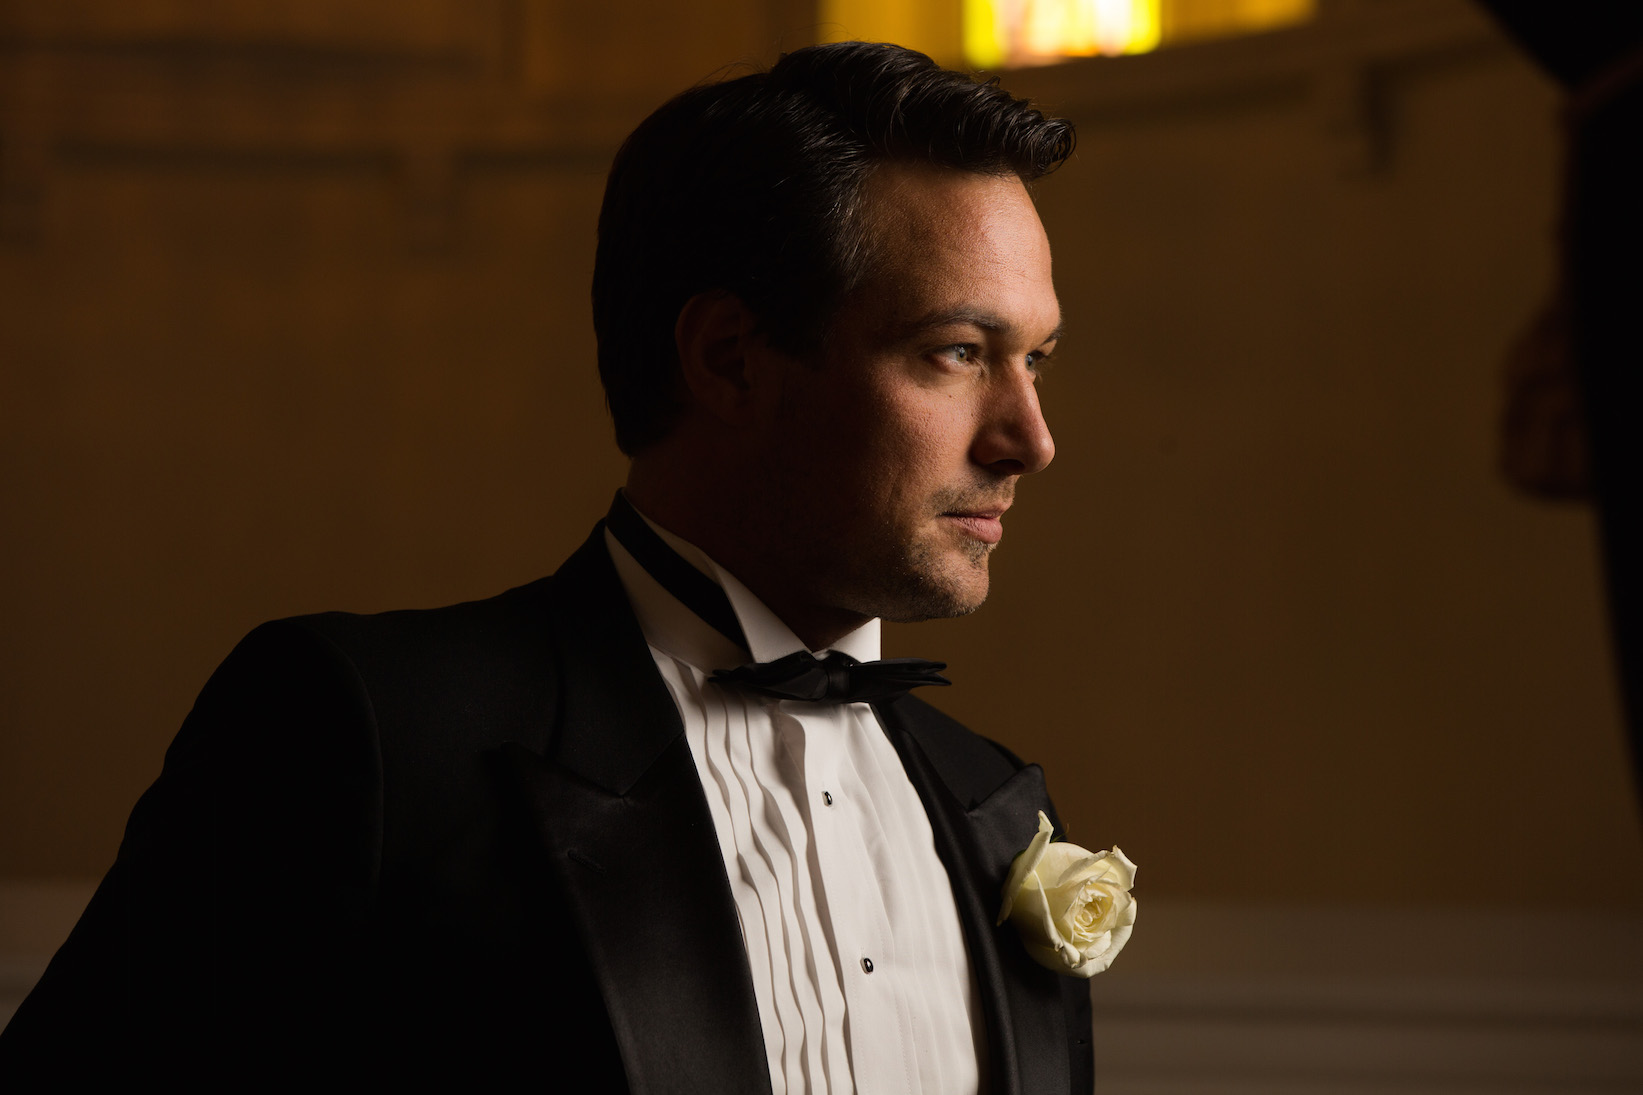 Groom Portrait - Wedding Photography